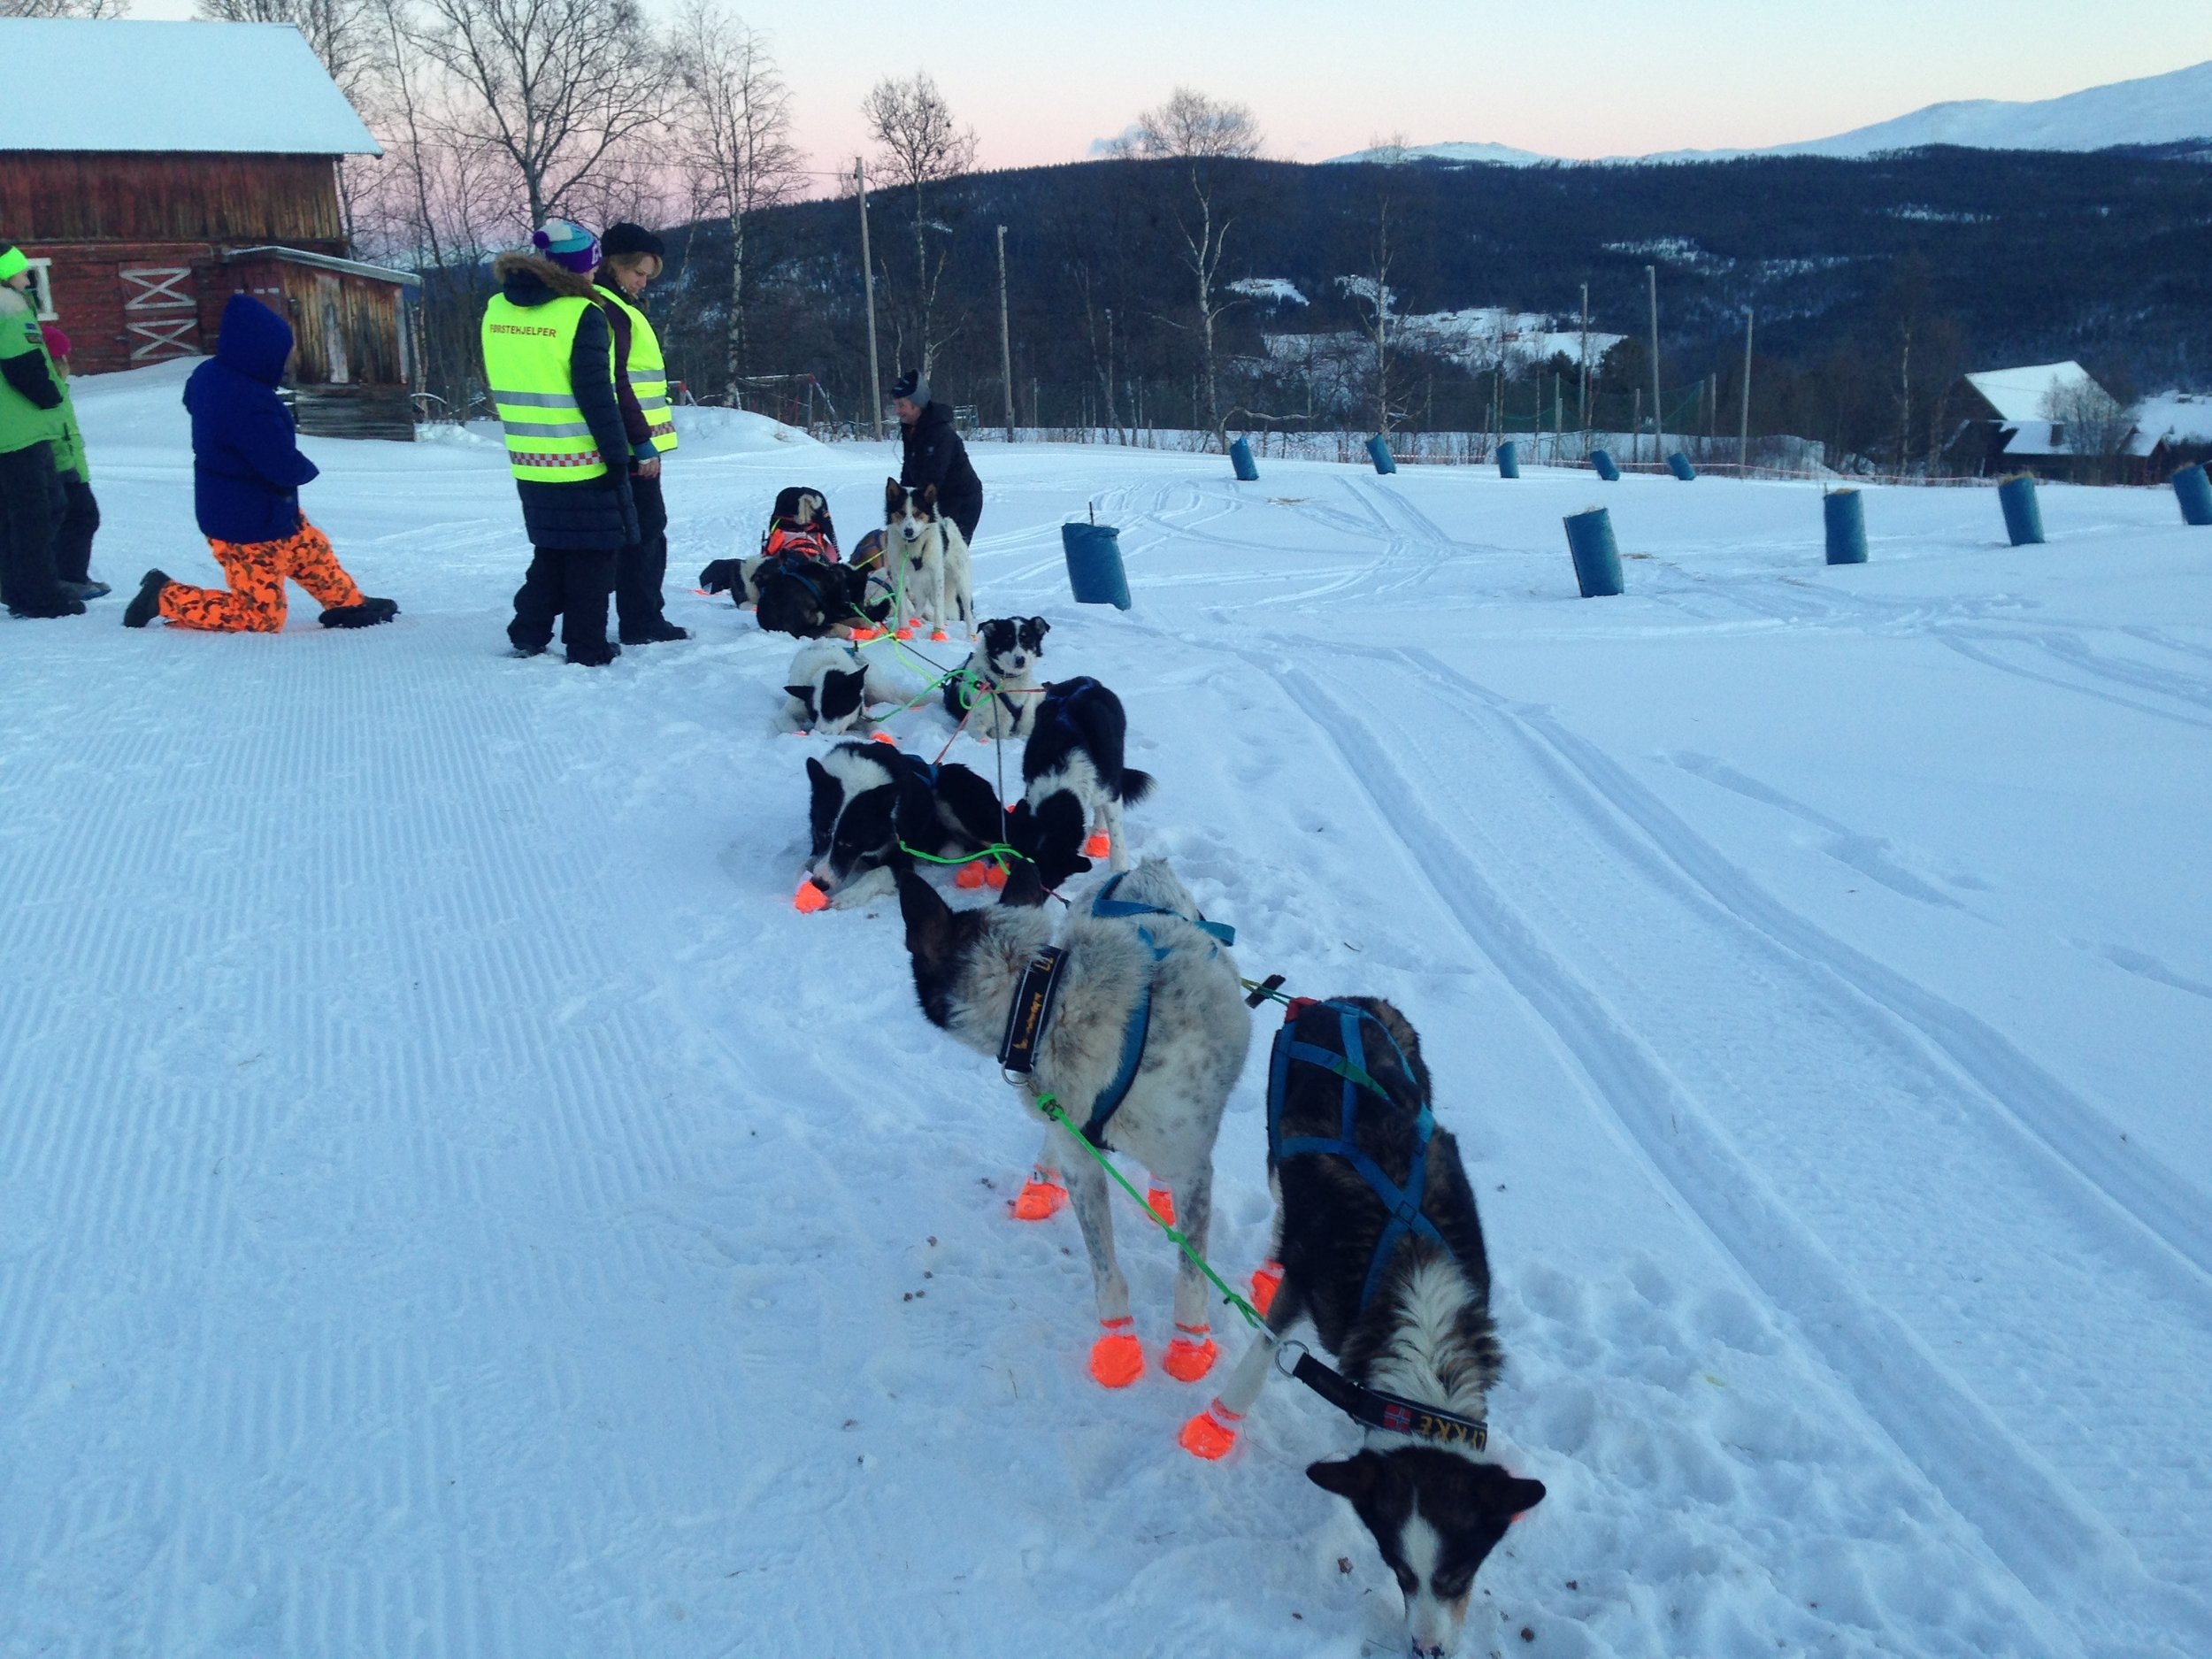 14. - 15. januar 2017 - Gausdal Maraton hundeløp, 300 km, med sjekkpunkt Skåbu